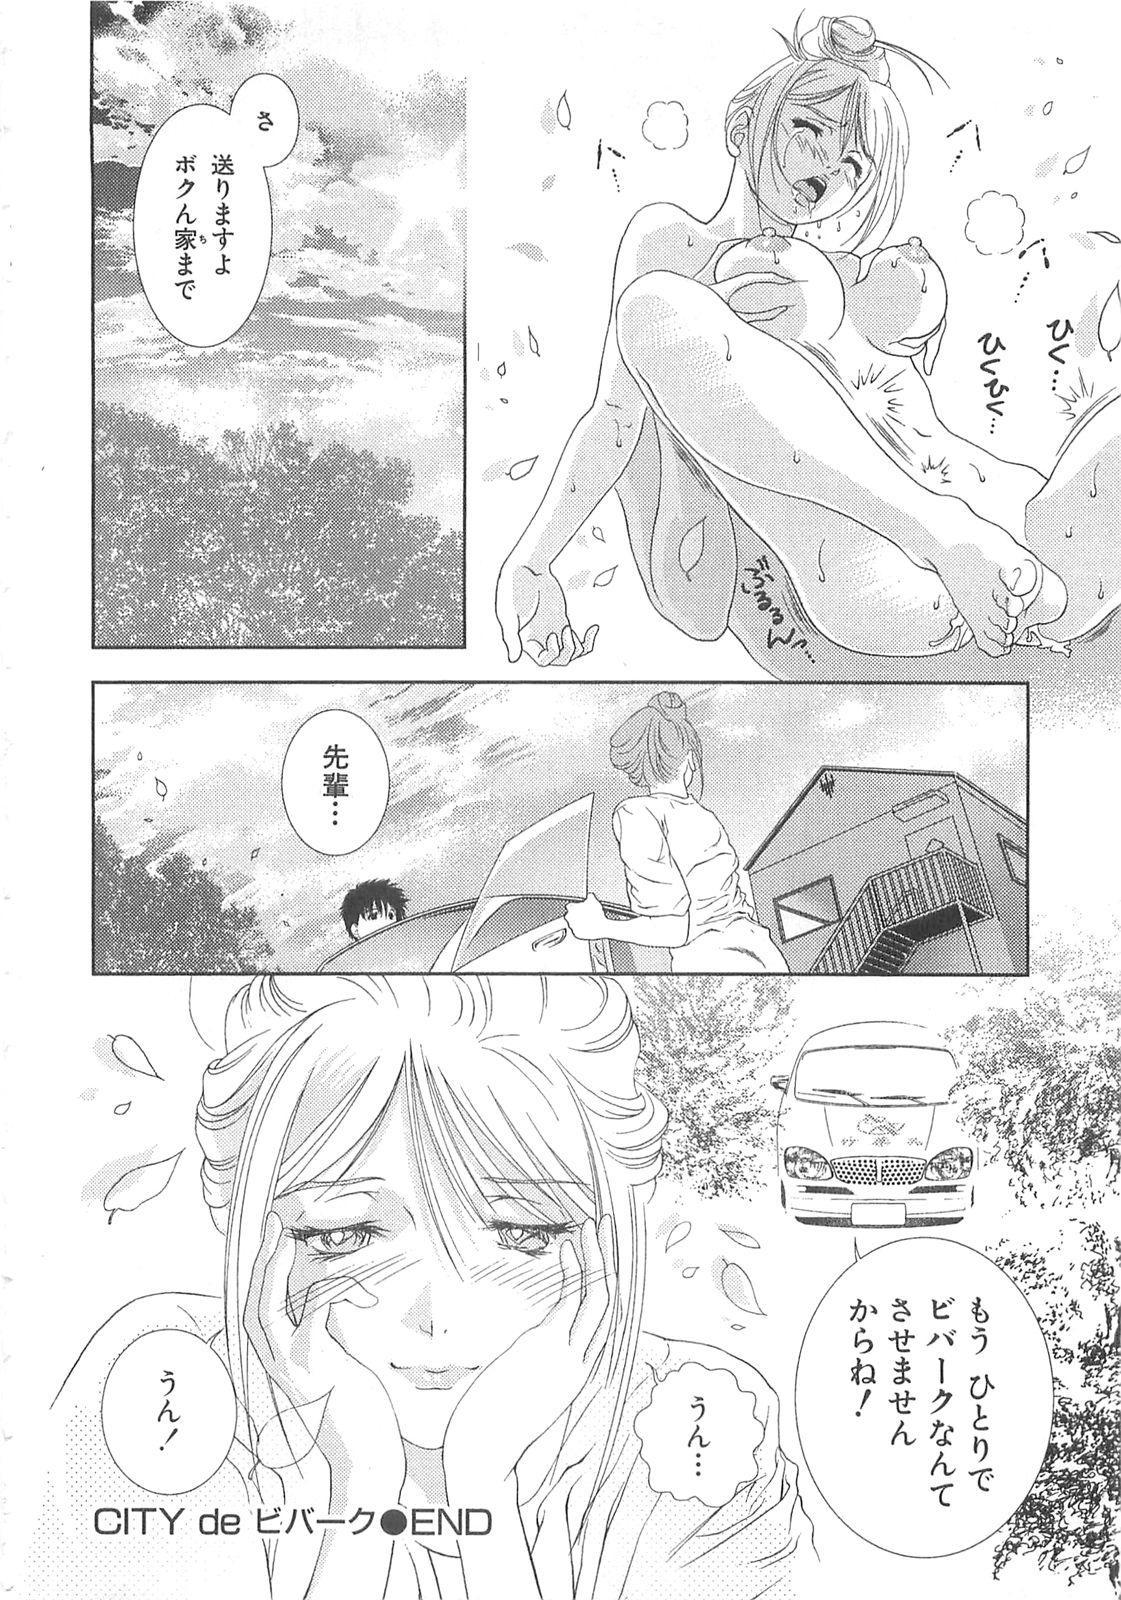 Tenshi no Kyuu - Angel's Pretty Hip 208